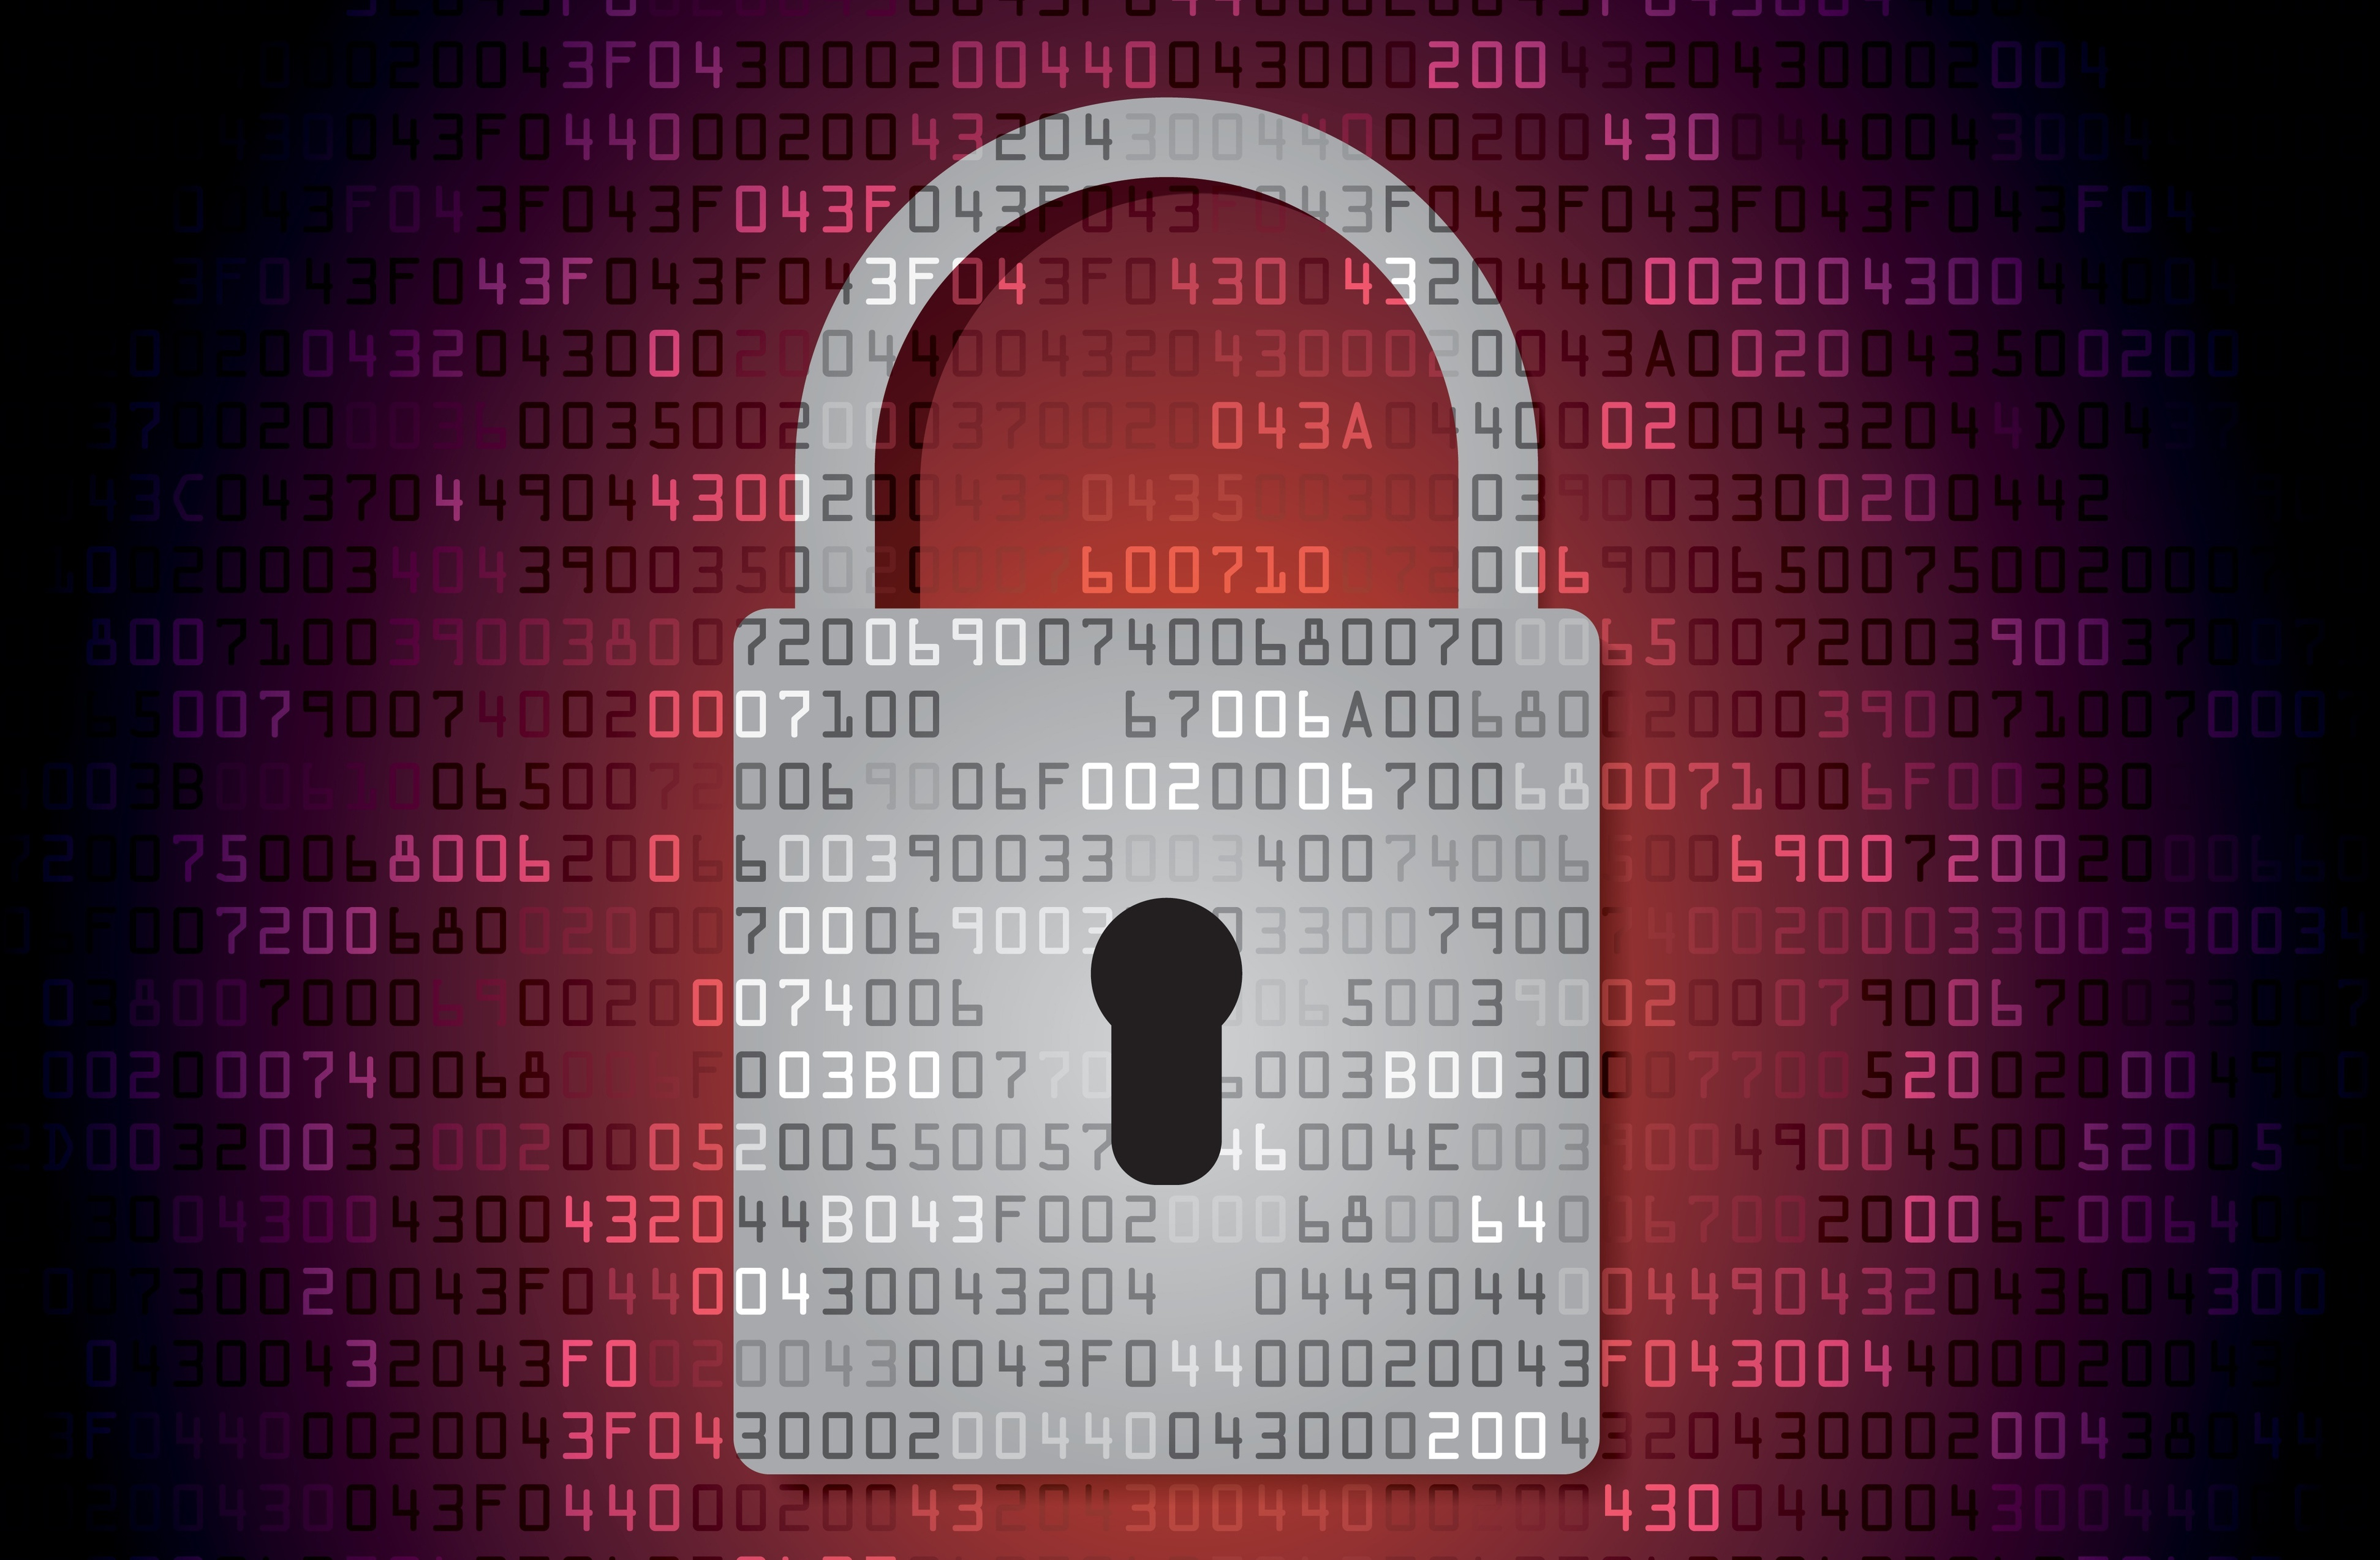 Locky - Encrypted Data